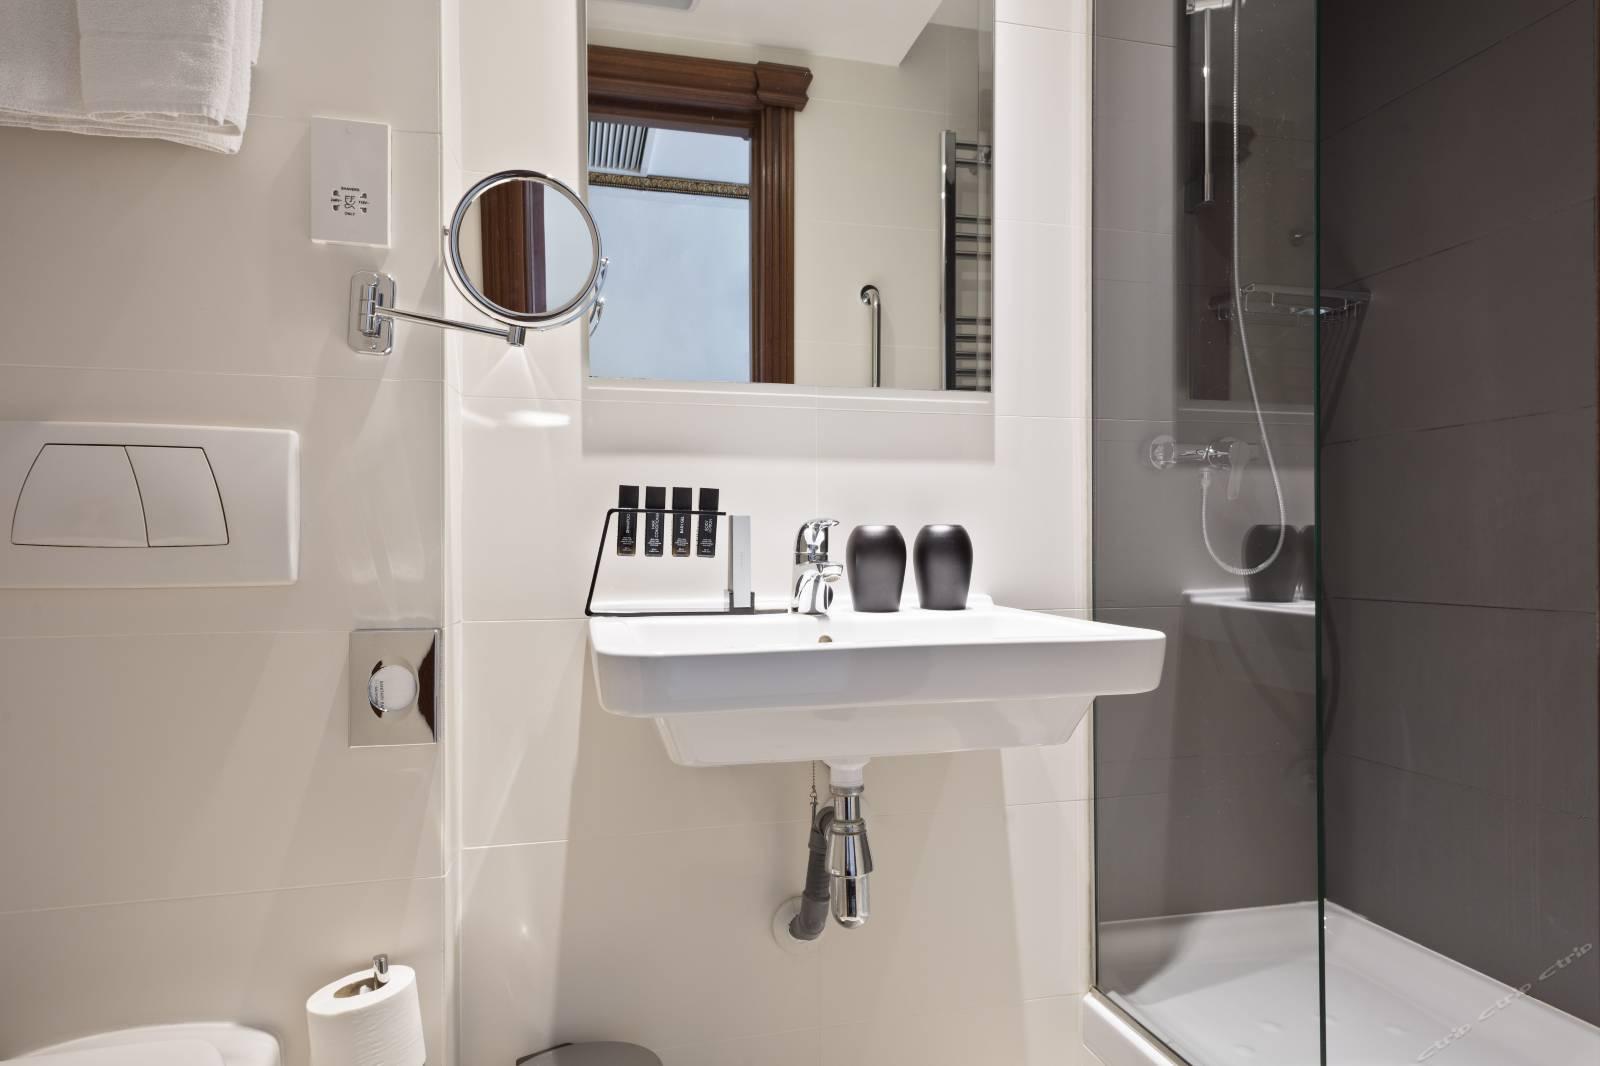 KEDIBO pratical wall mounted wash basins right for bathroom